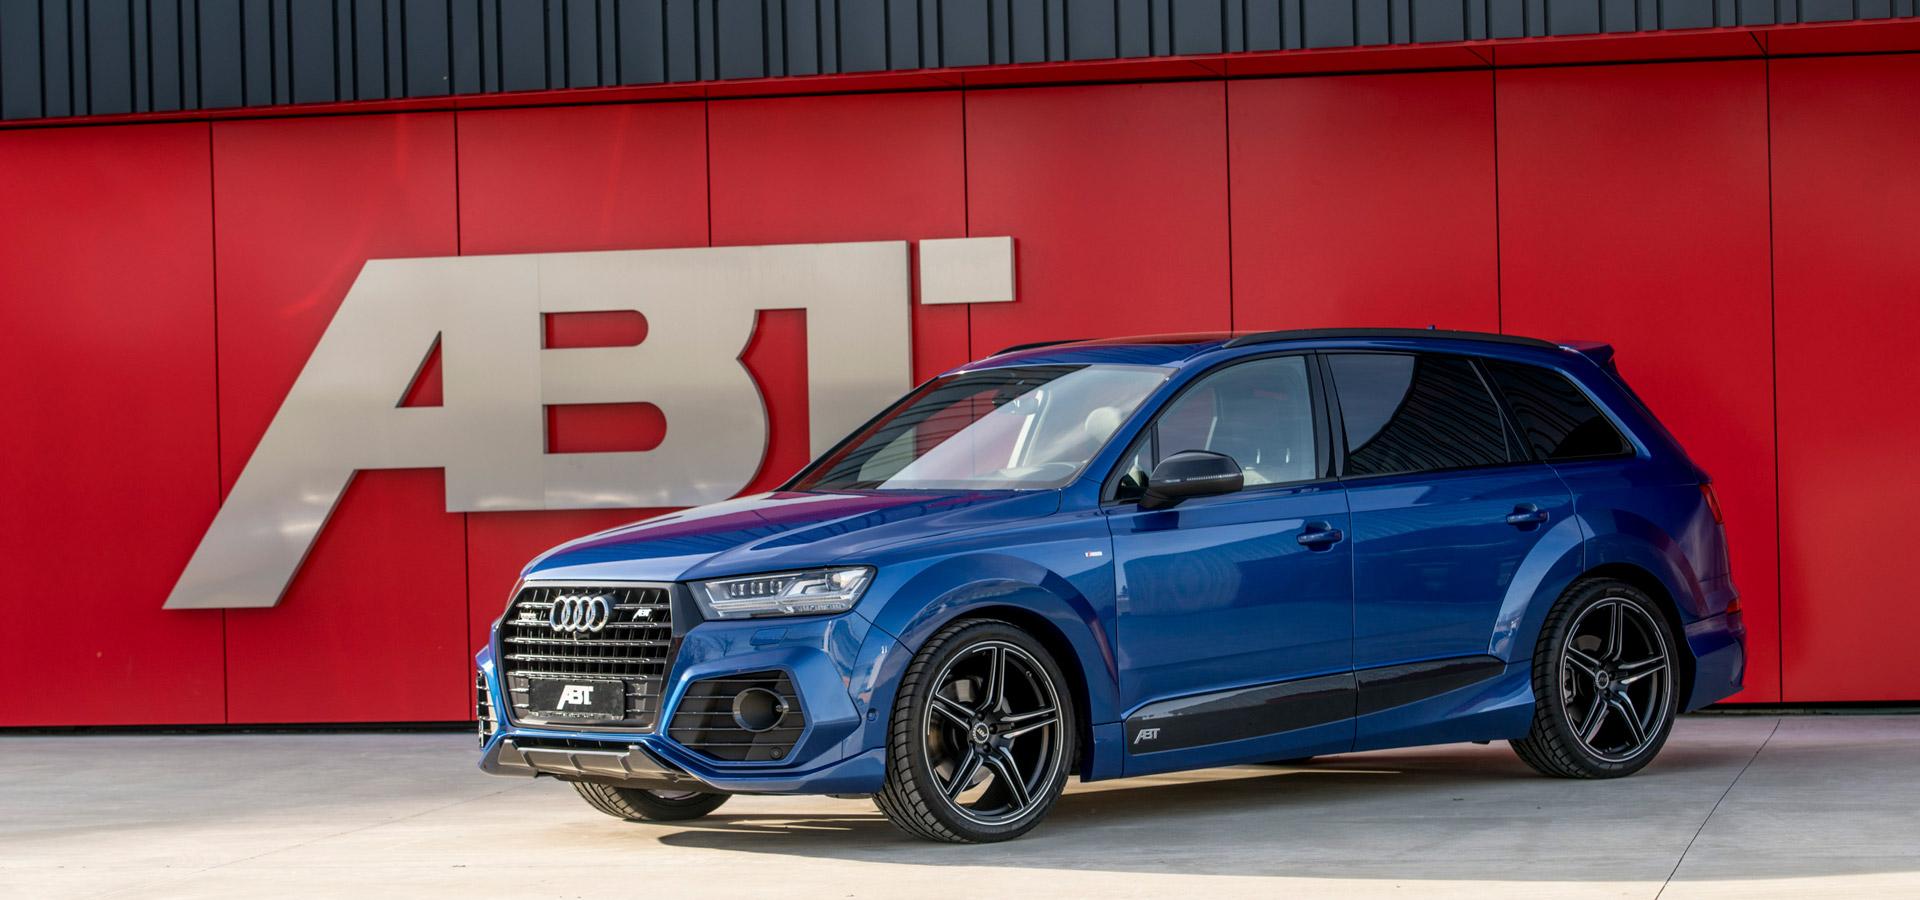 Audi Q7 Abt Sportsline